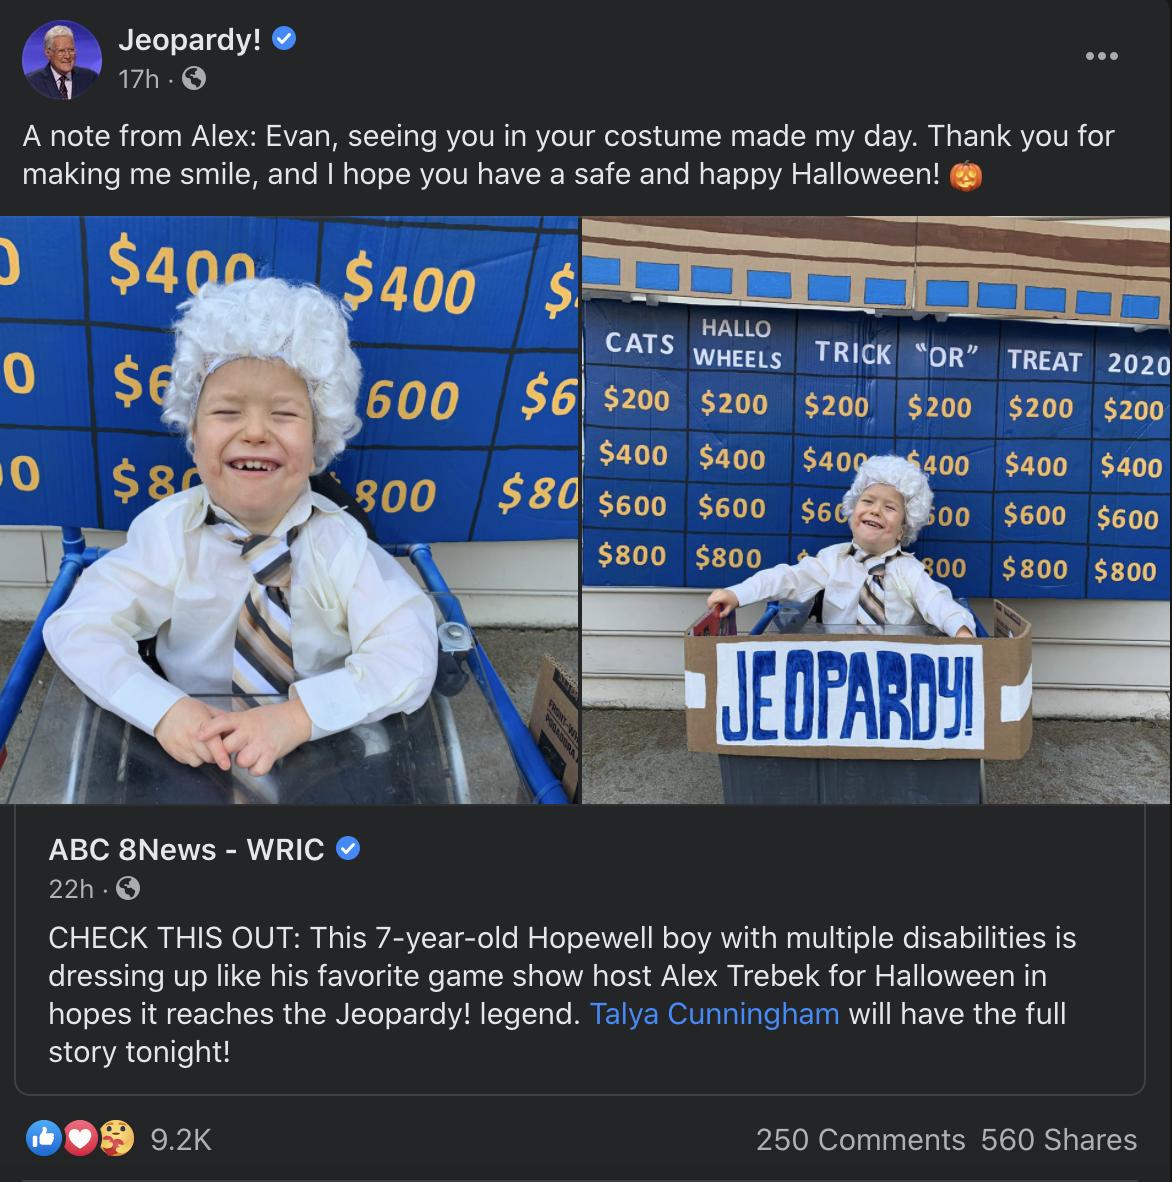 7-Year-Old 'Jeopardy!' Fan Dresses Up As Alex Trebek For Halloween, Gets Sweet Message In Return